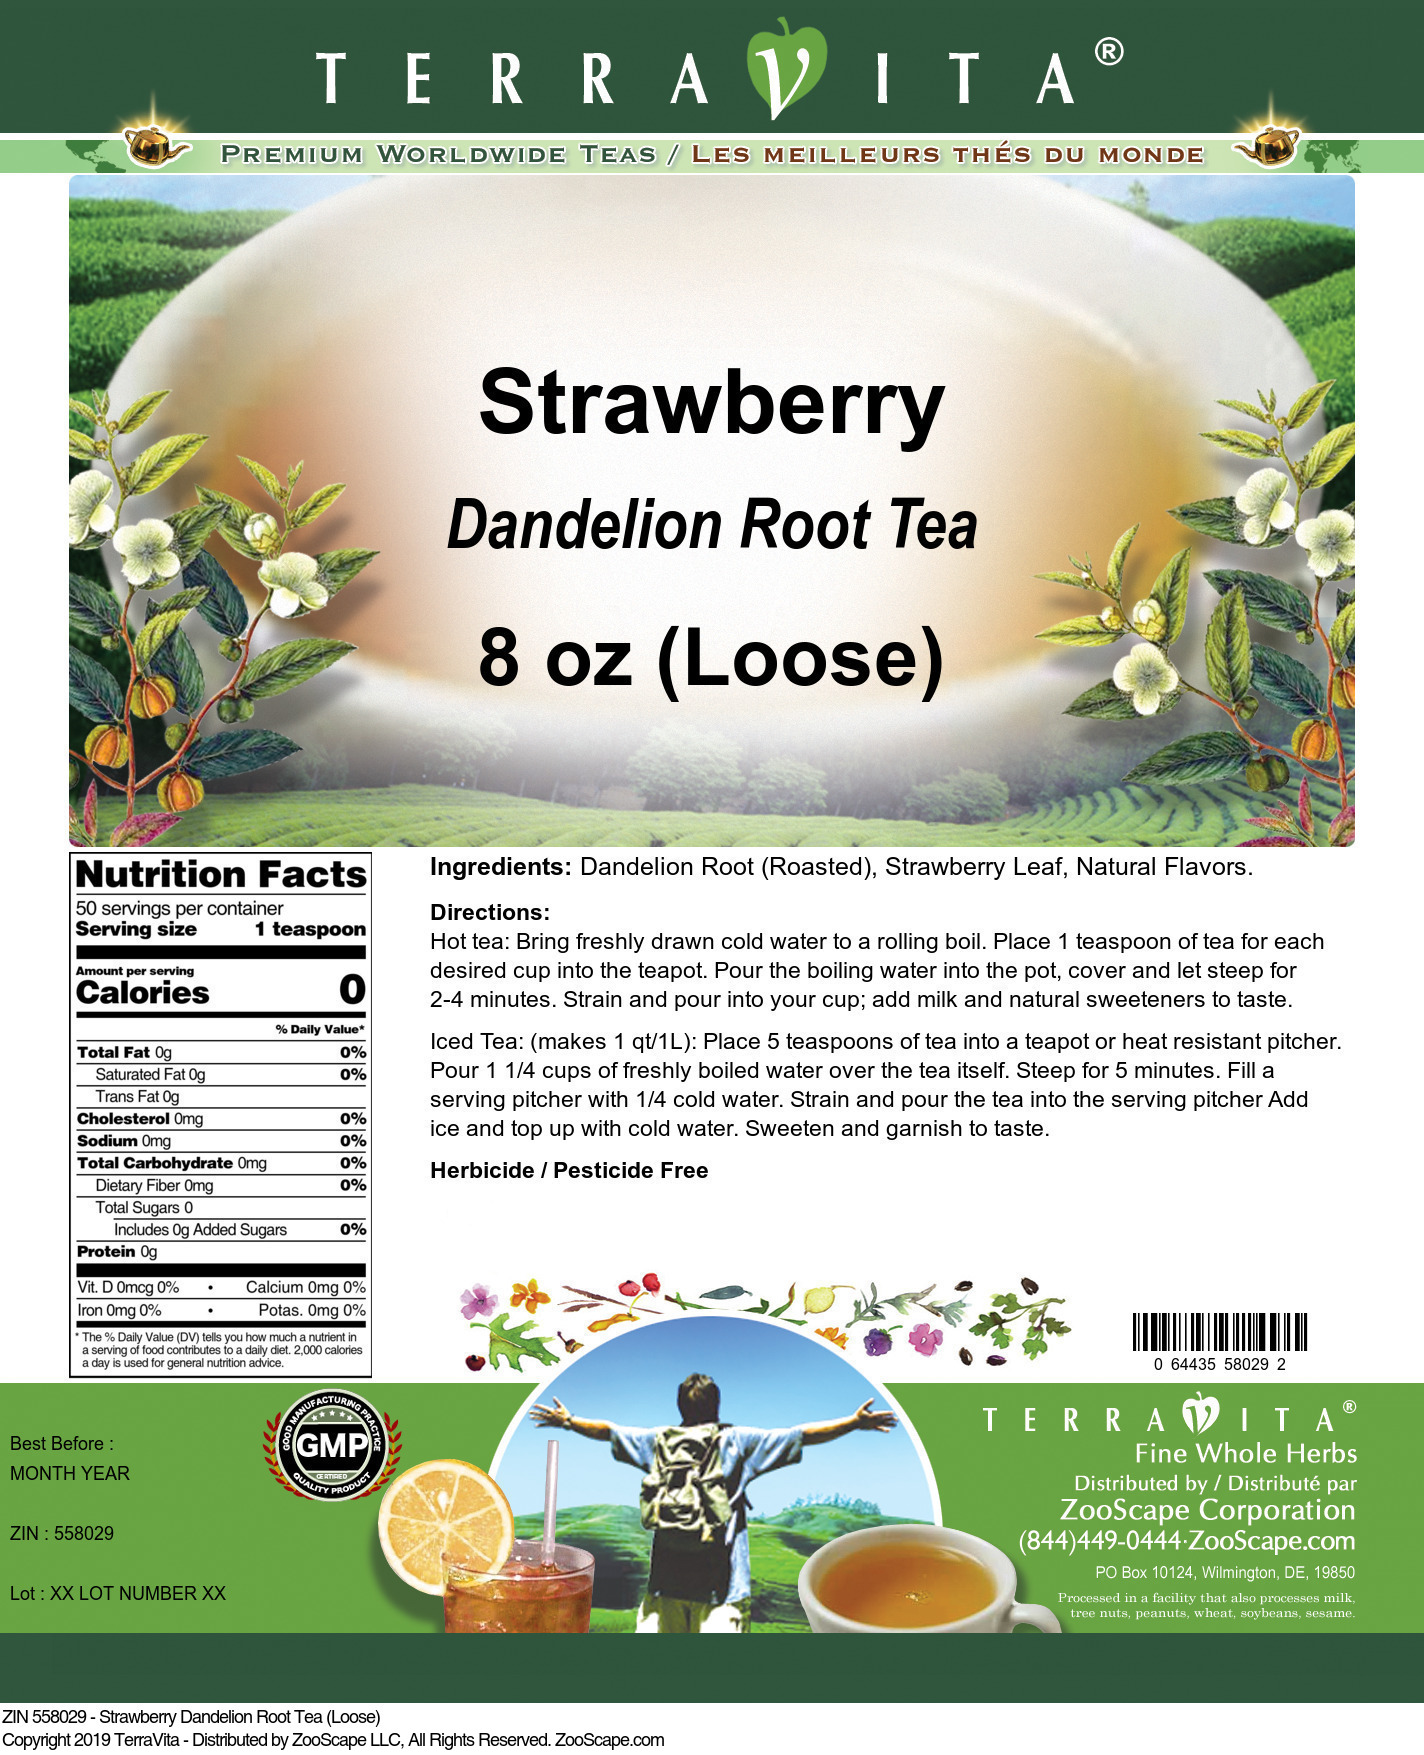 Strawberry Dandelion Root